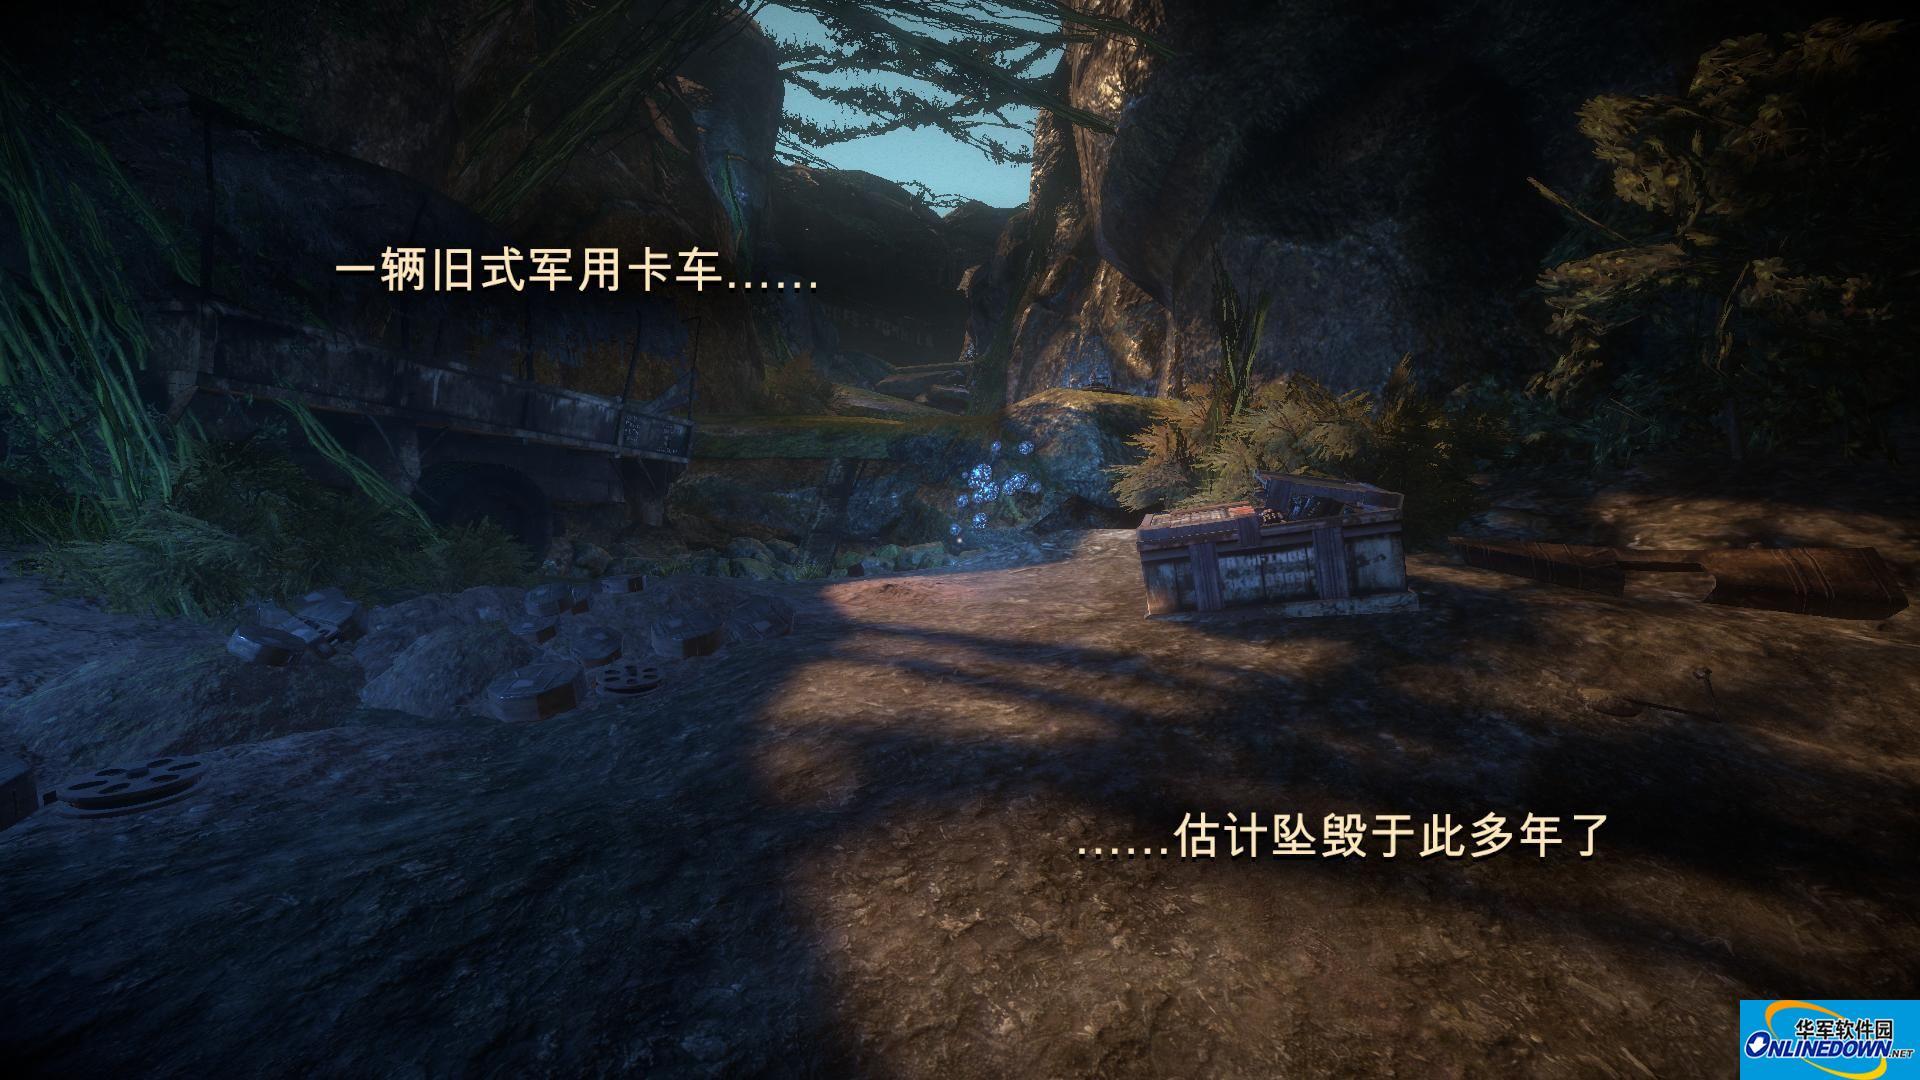 Valley游侠LMAO汉化补丁V1.0